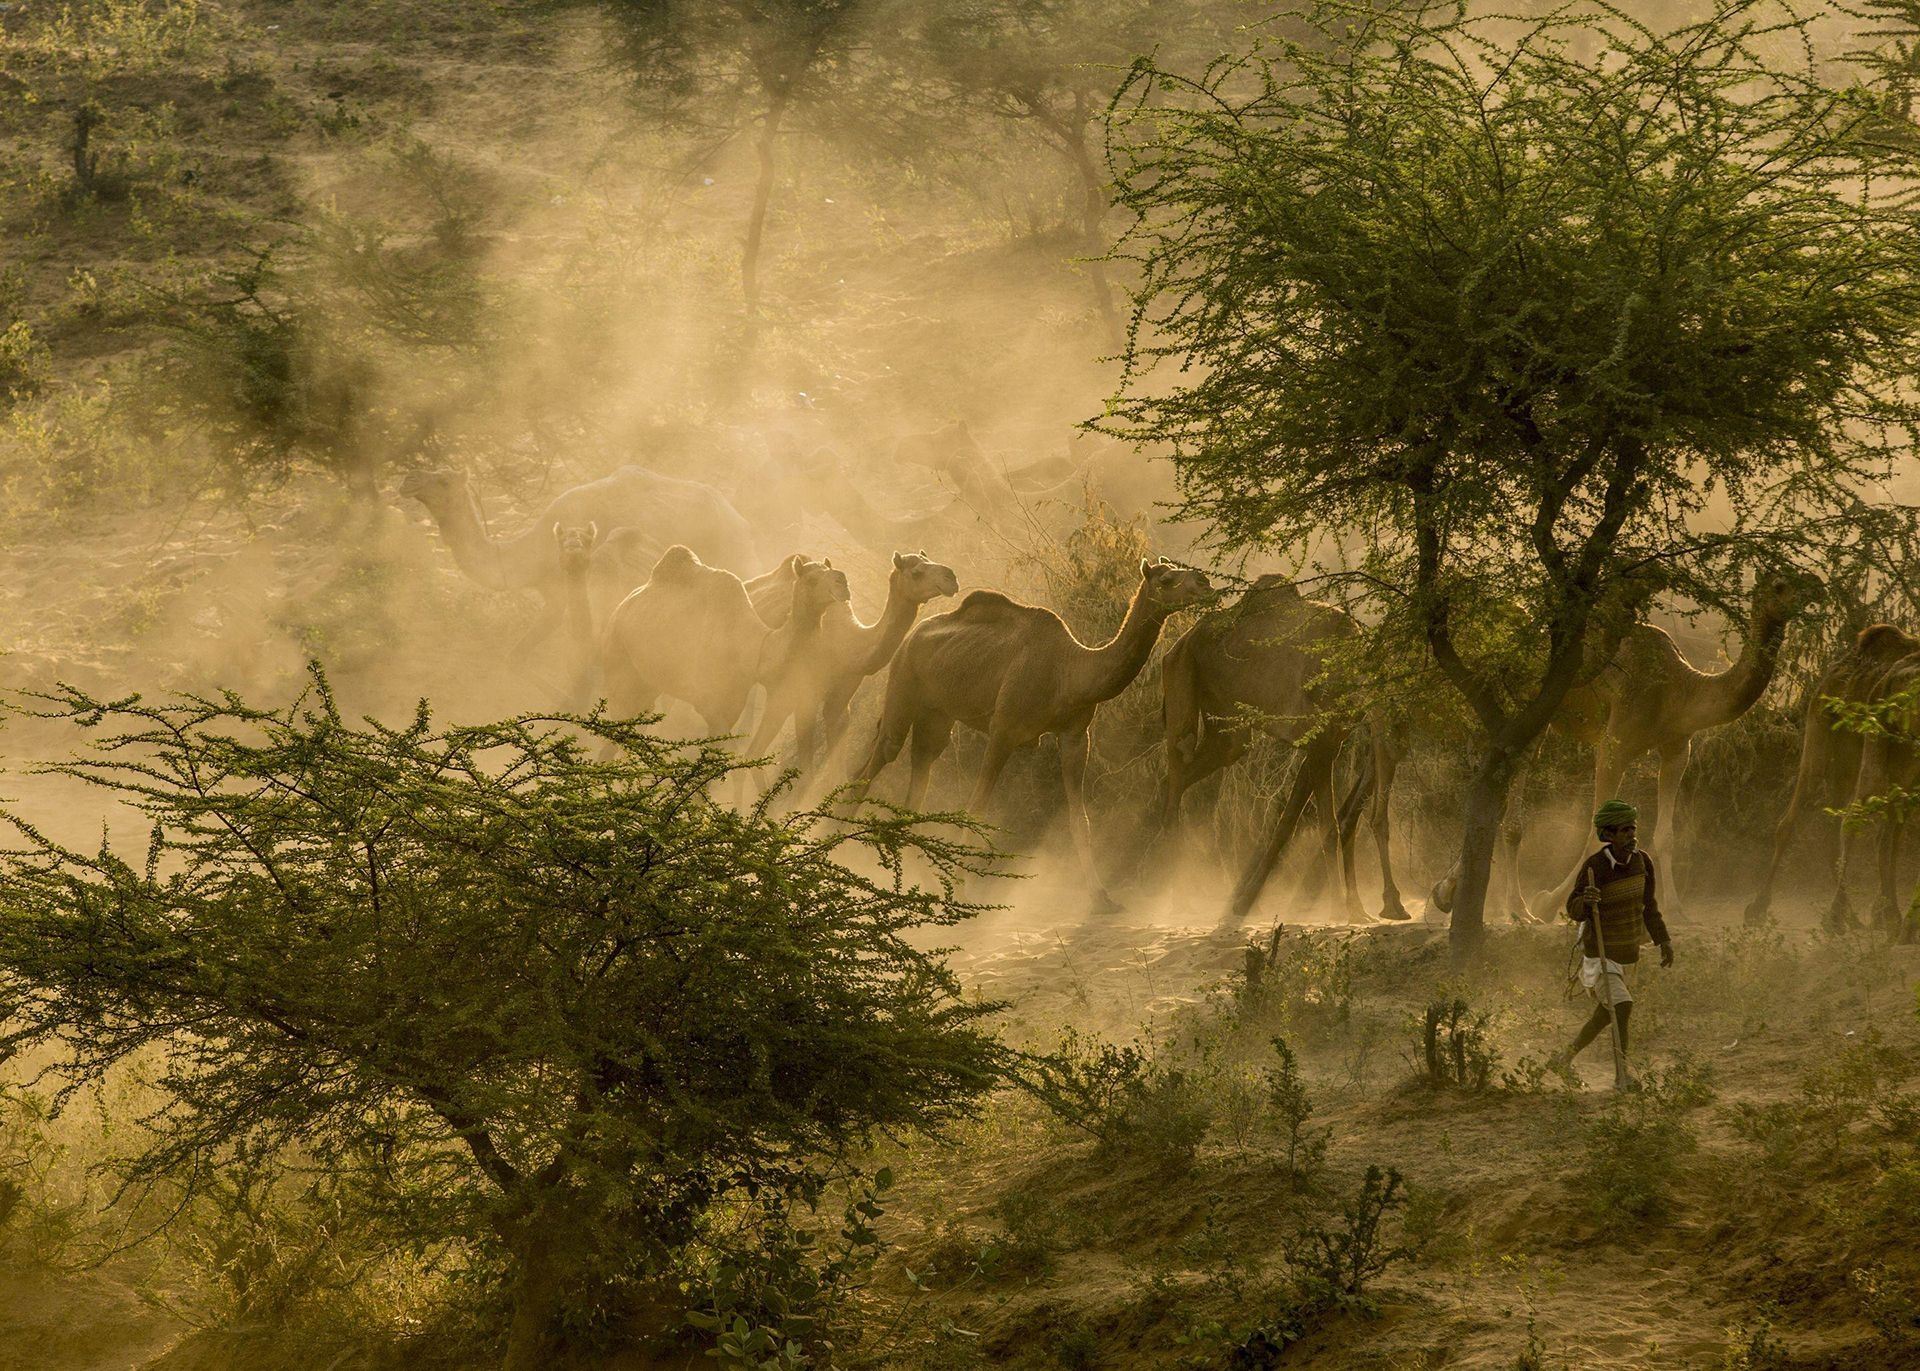 Photograph by Jiti Chadha, National Geographic